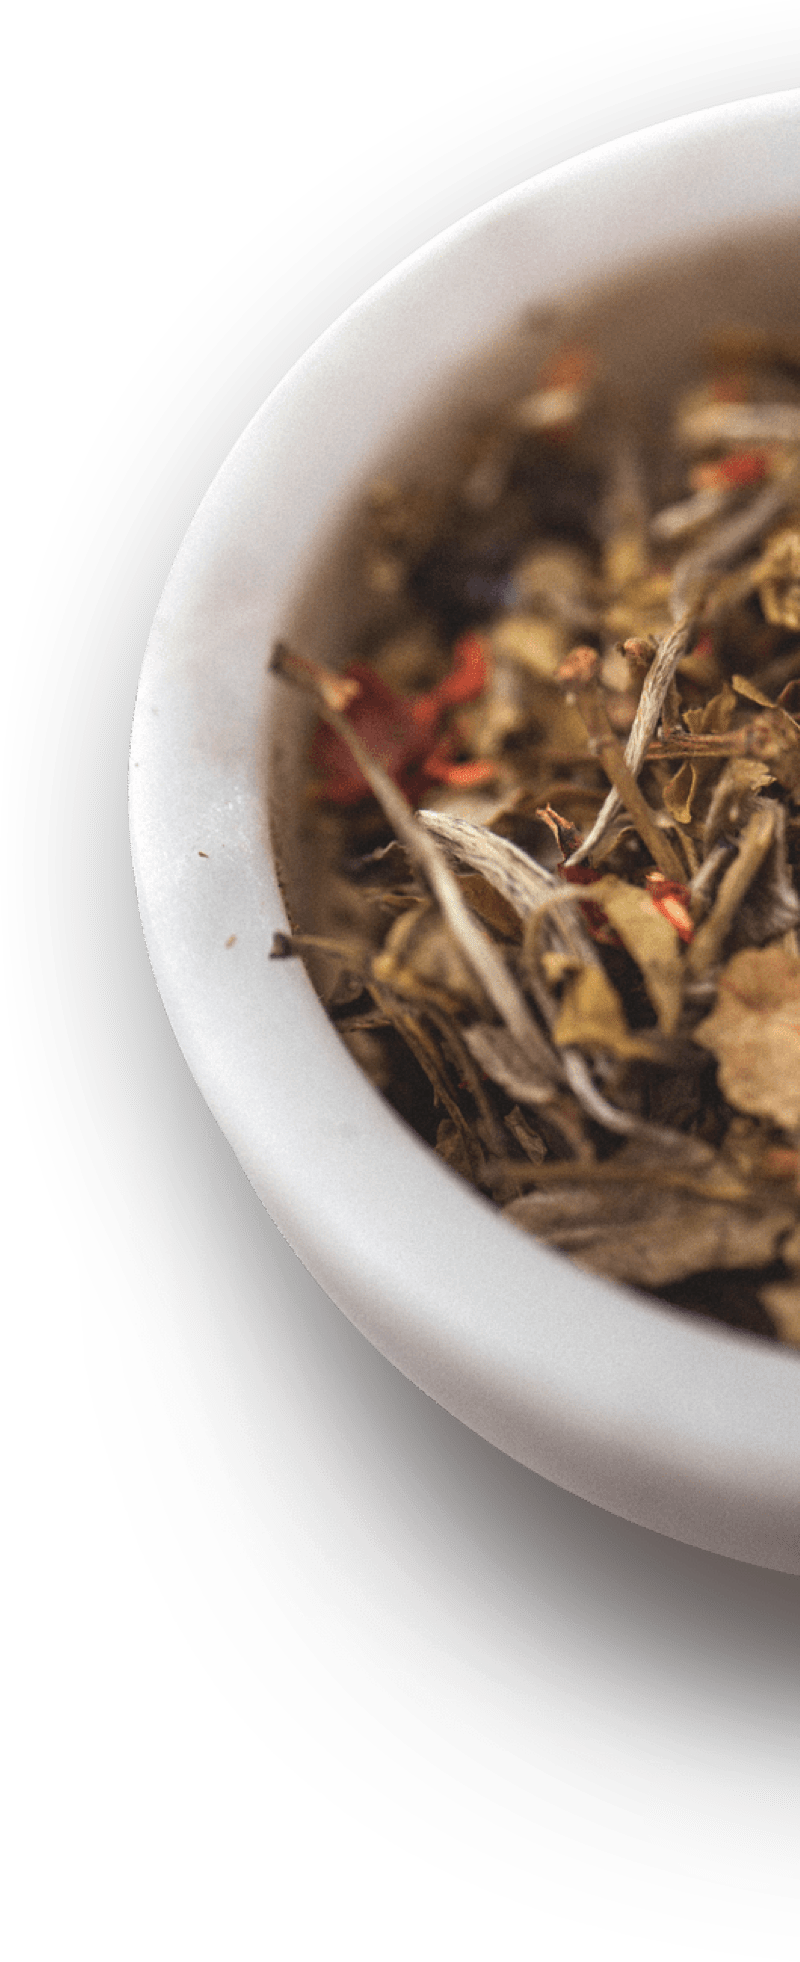 herbal remedy 13